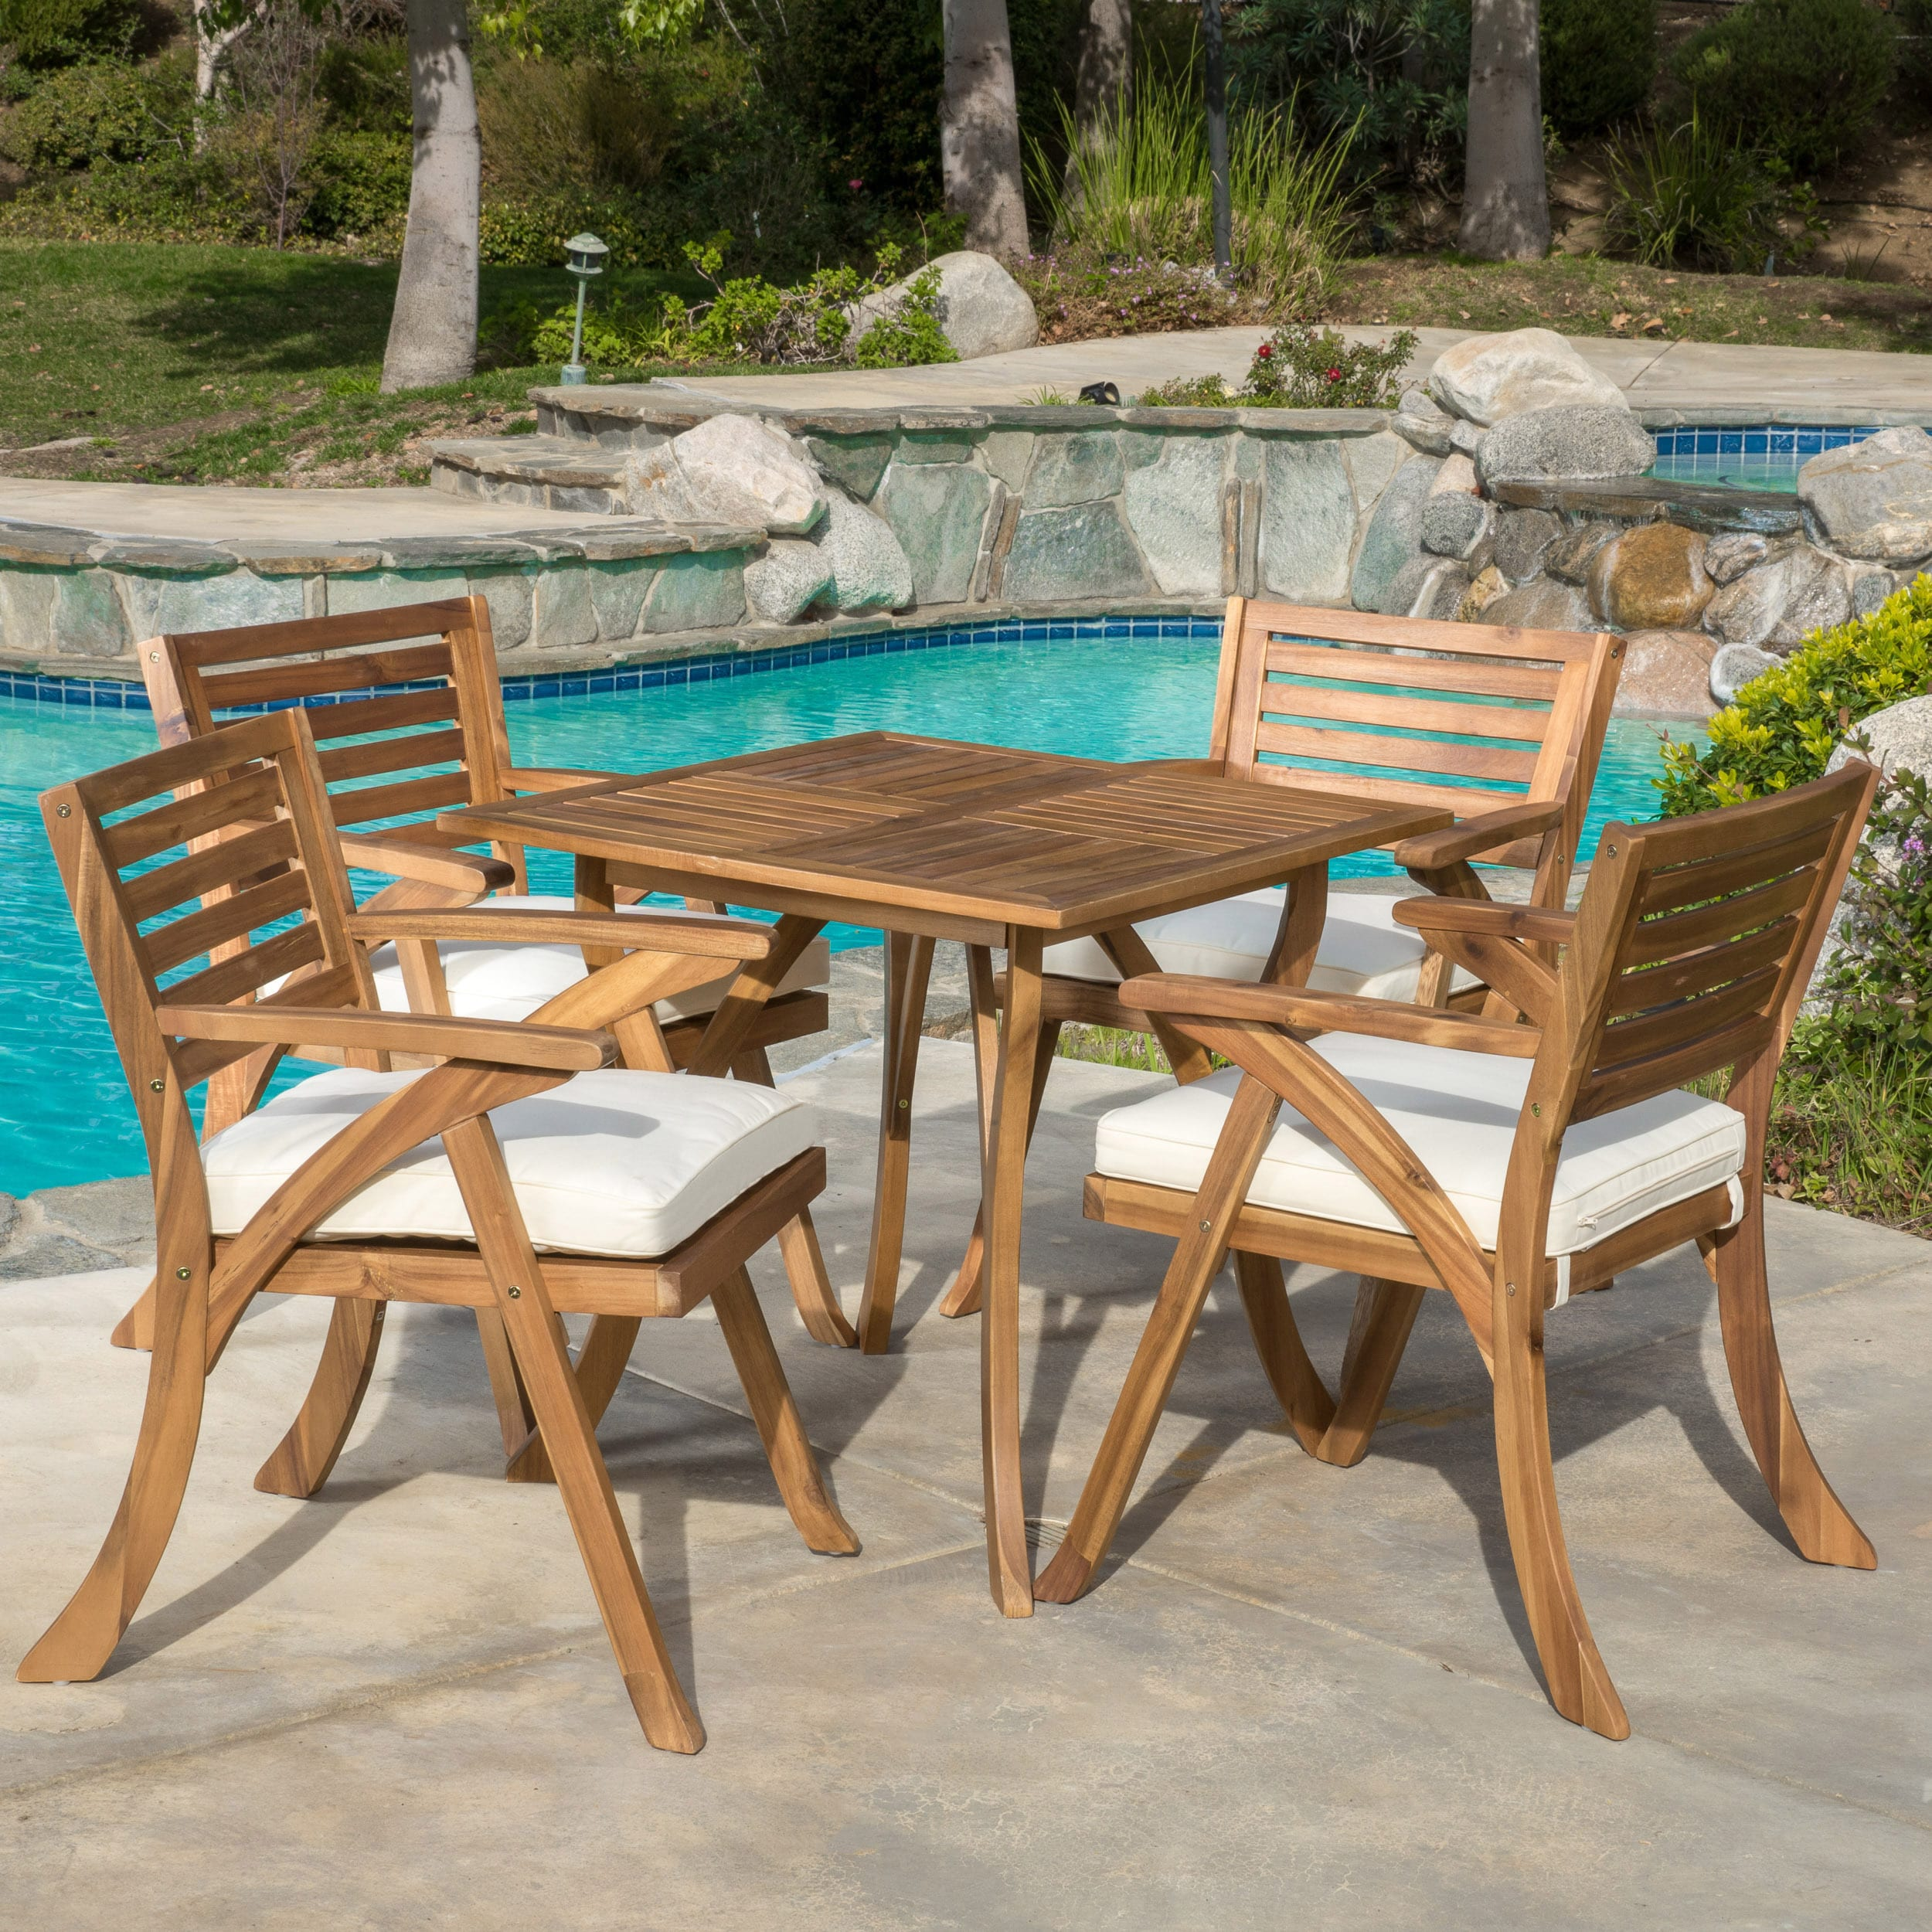 Christopher-Knight-Home-Outdoor-Hermosa-5-piece-Acacia-Wood-Dining-Set-with-Cushions-2e85292f-da13-4a0b-b233-6770c7aee724.jpg (2500×2500)